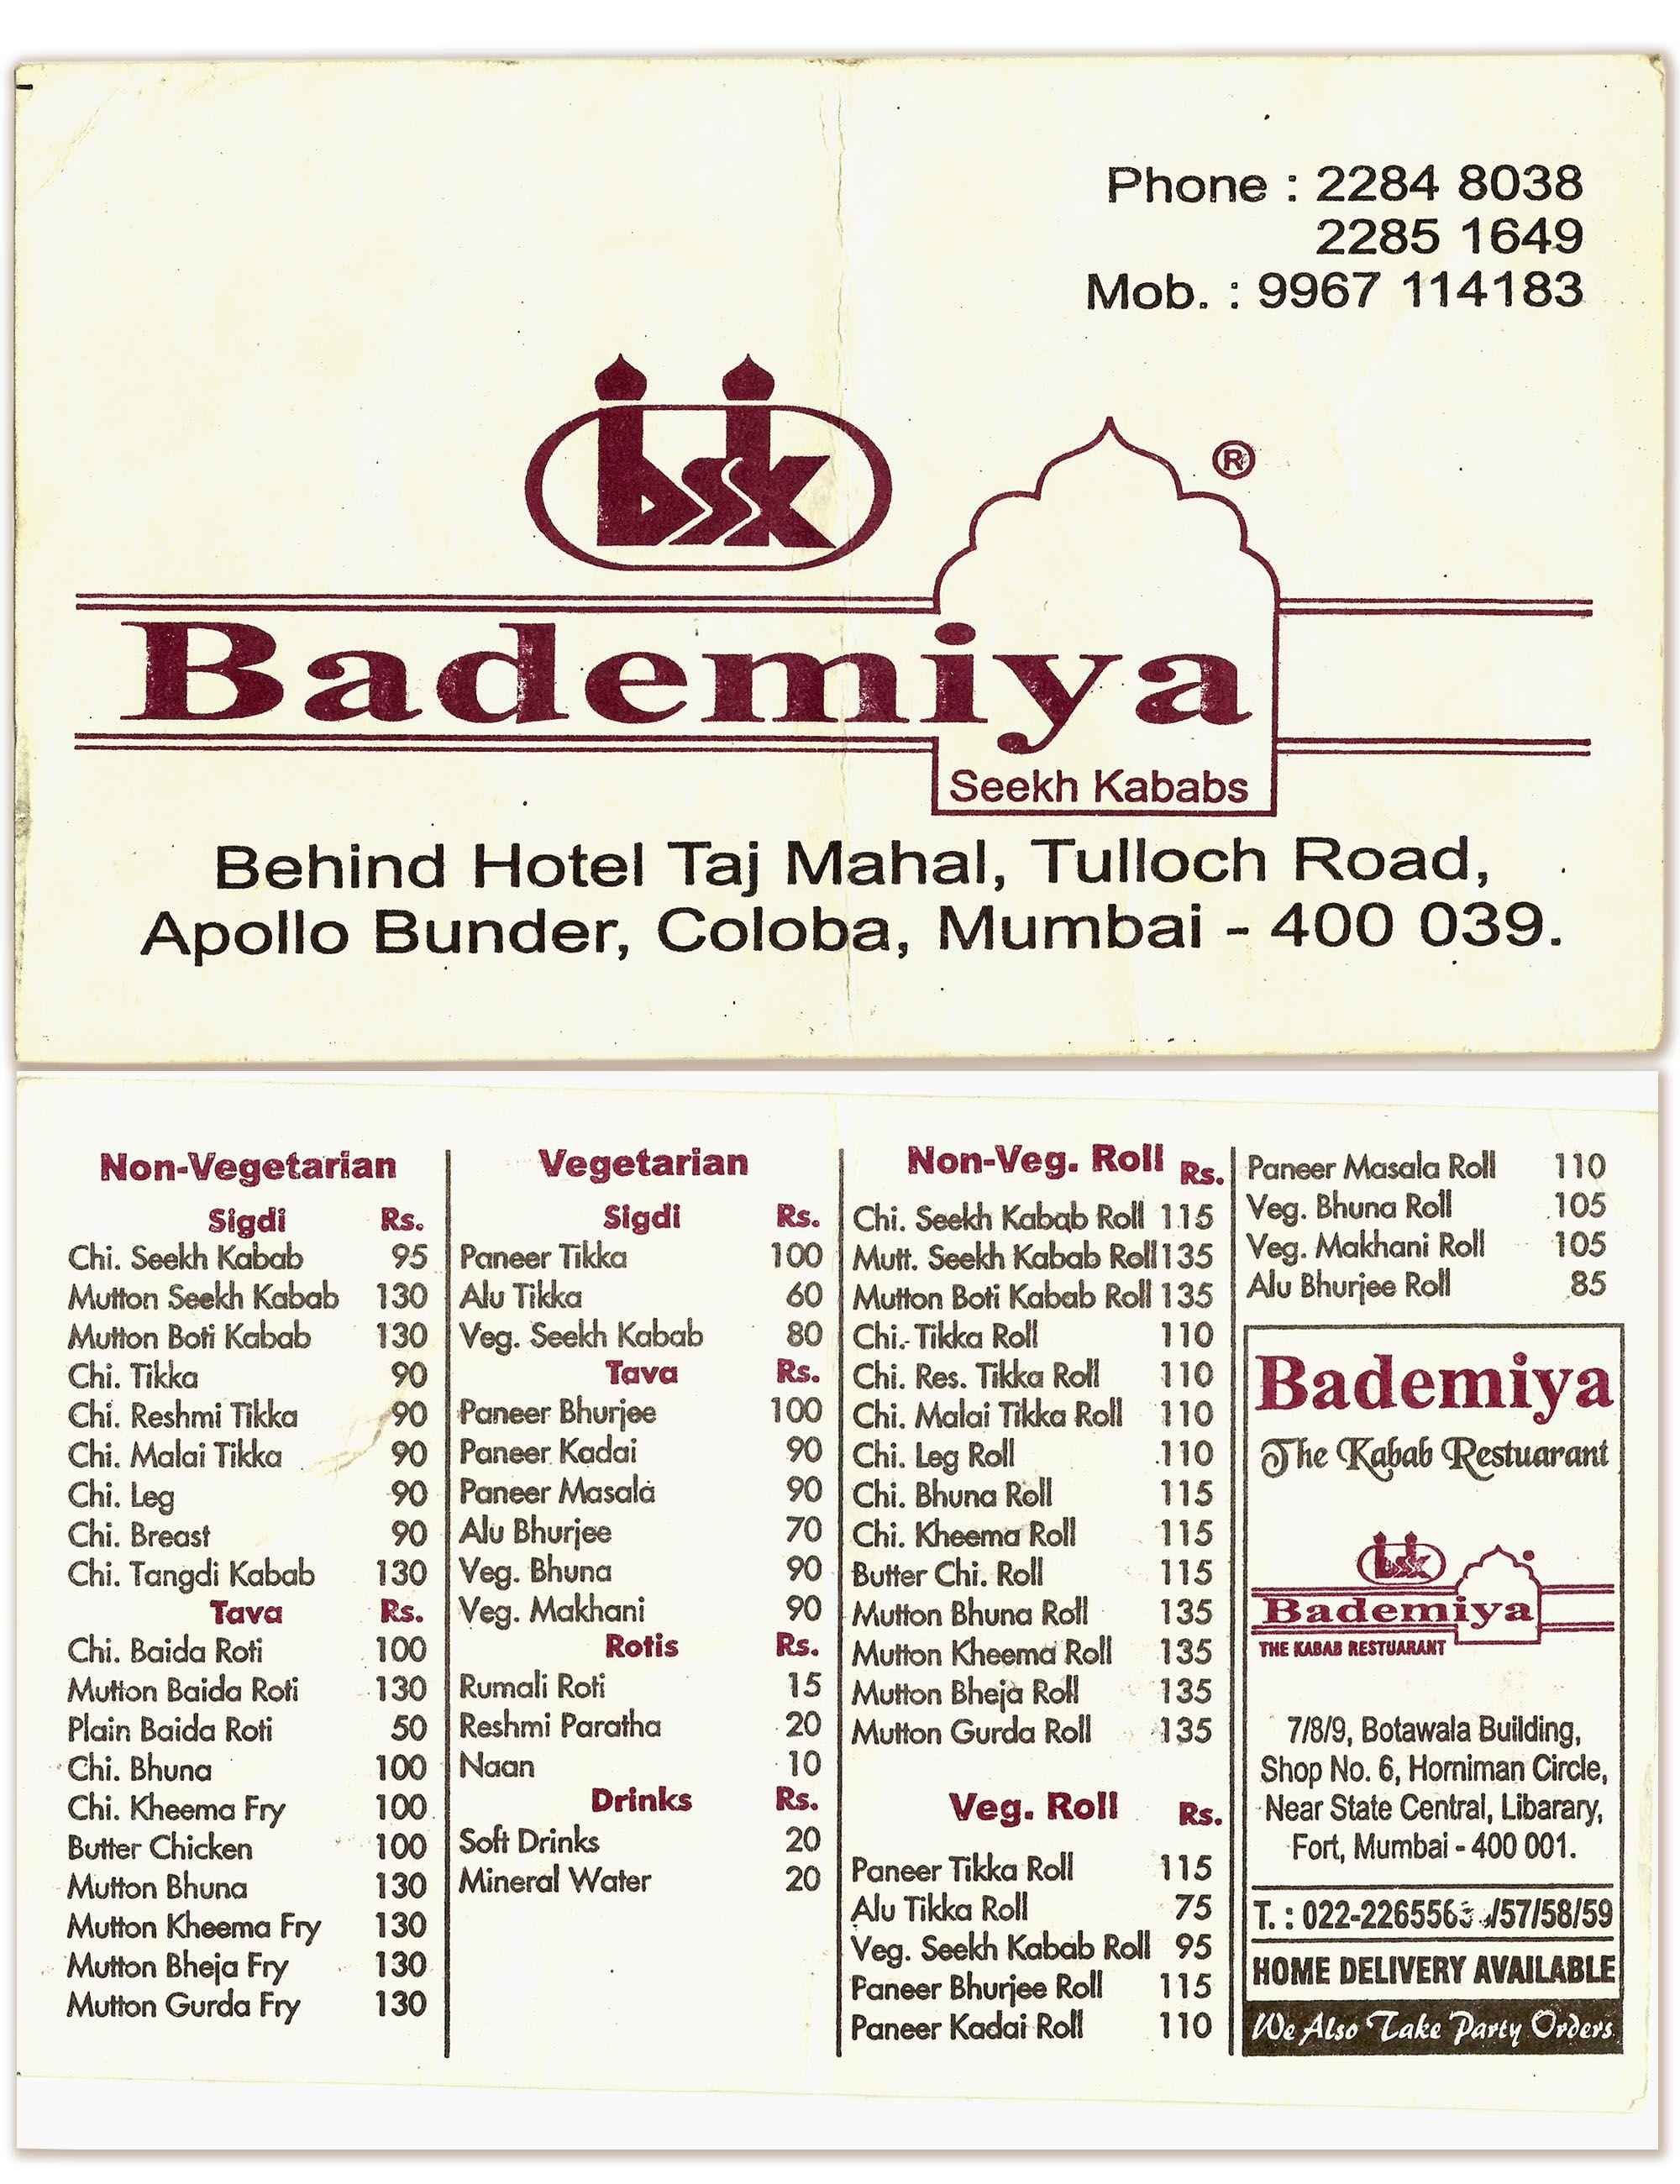 Bademiya mumbai street food review mumbai street food